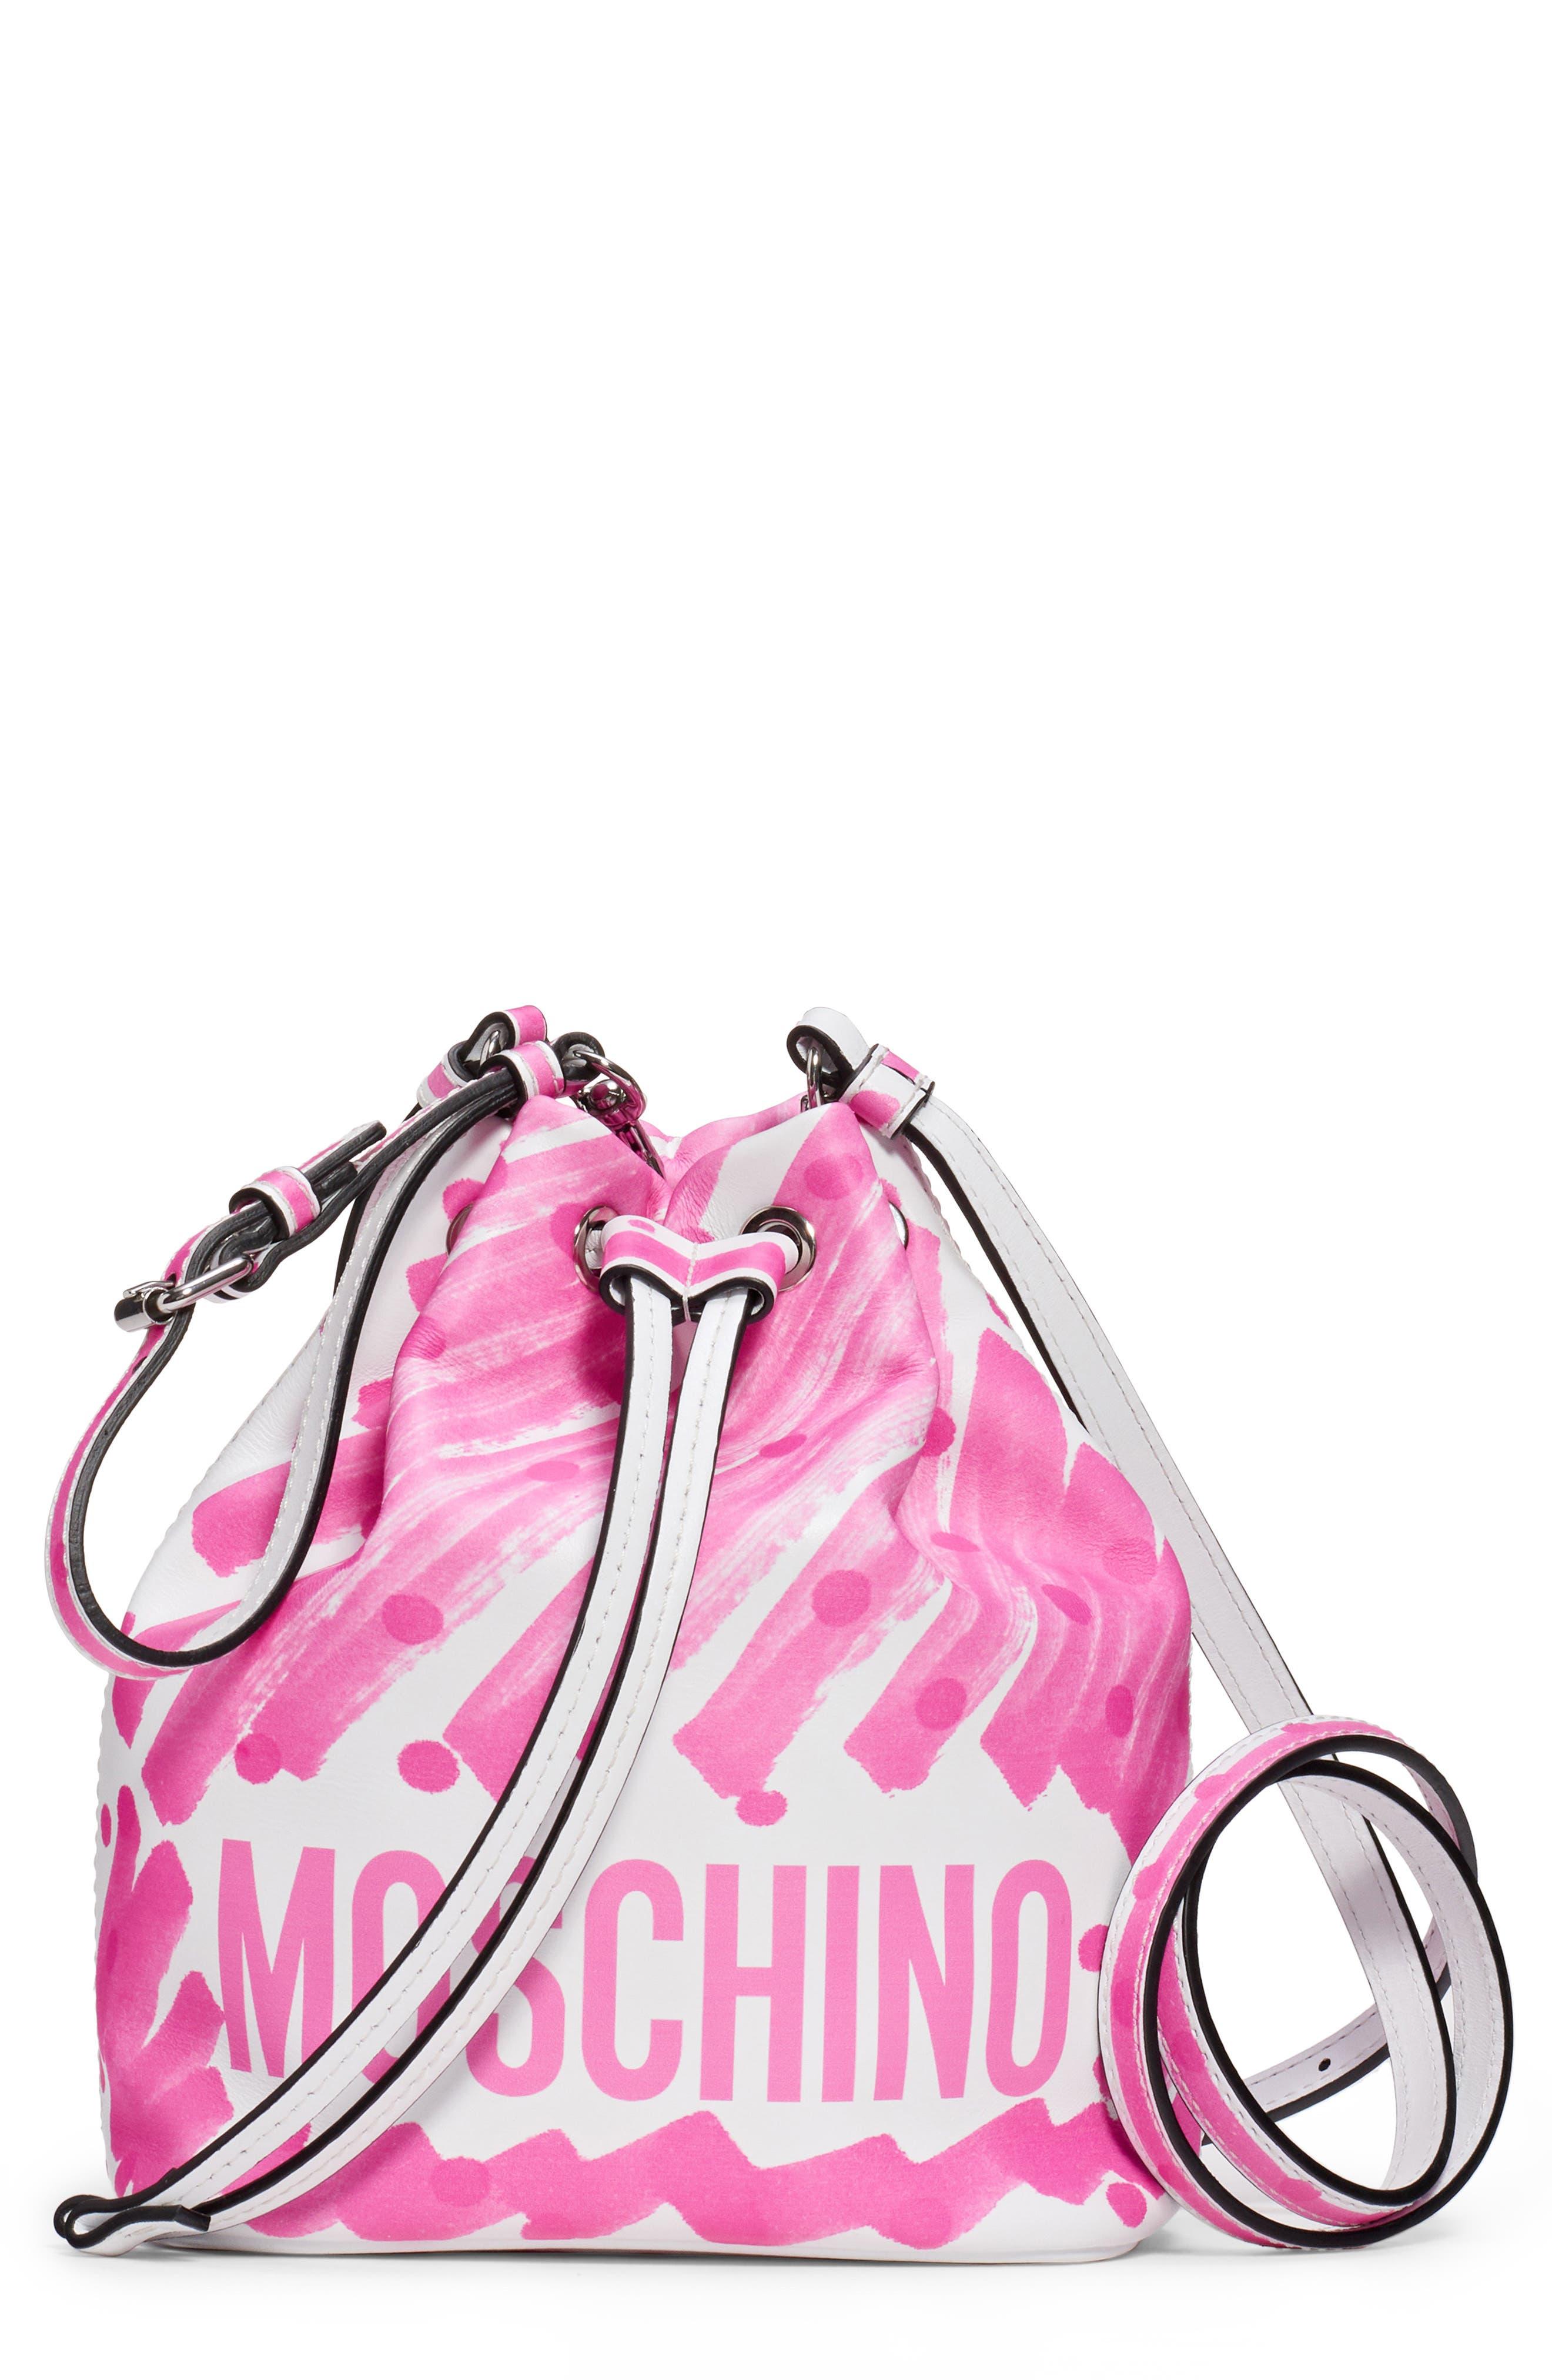 MOSCHINO, Scribble Dot Bucket Bag, Main thumbnail 1, color, FANTASY PRINT FUSCHIA